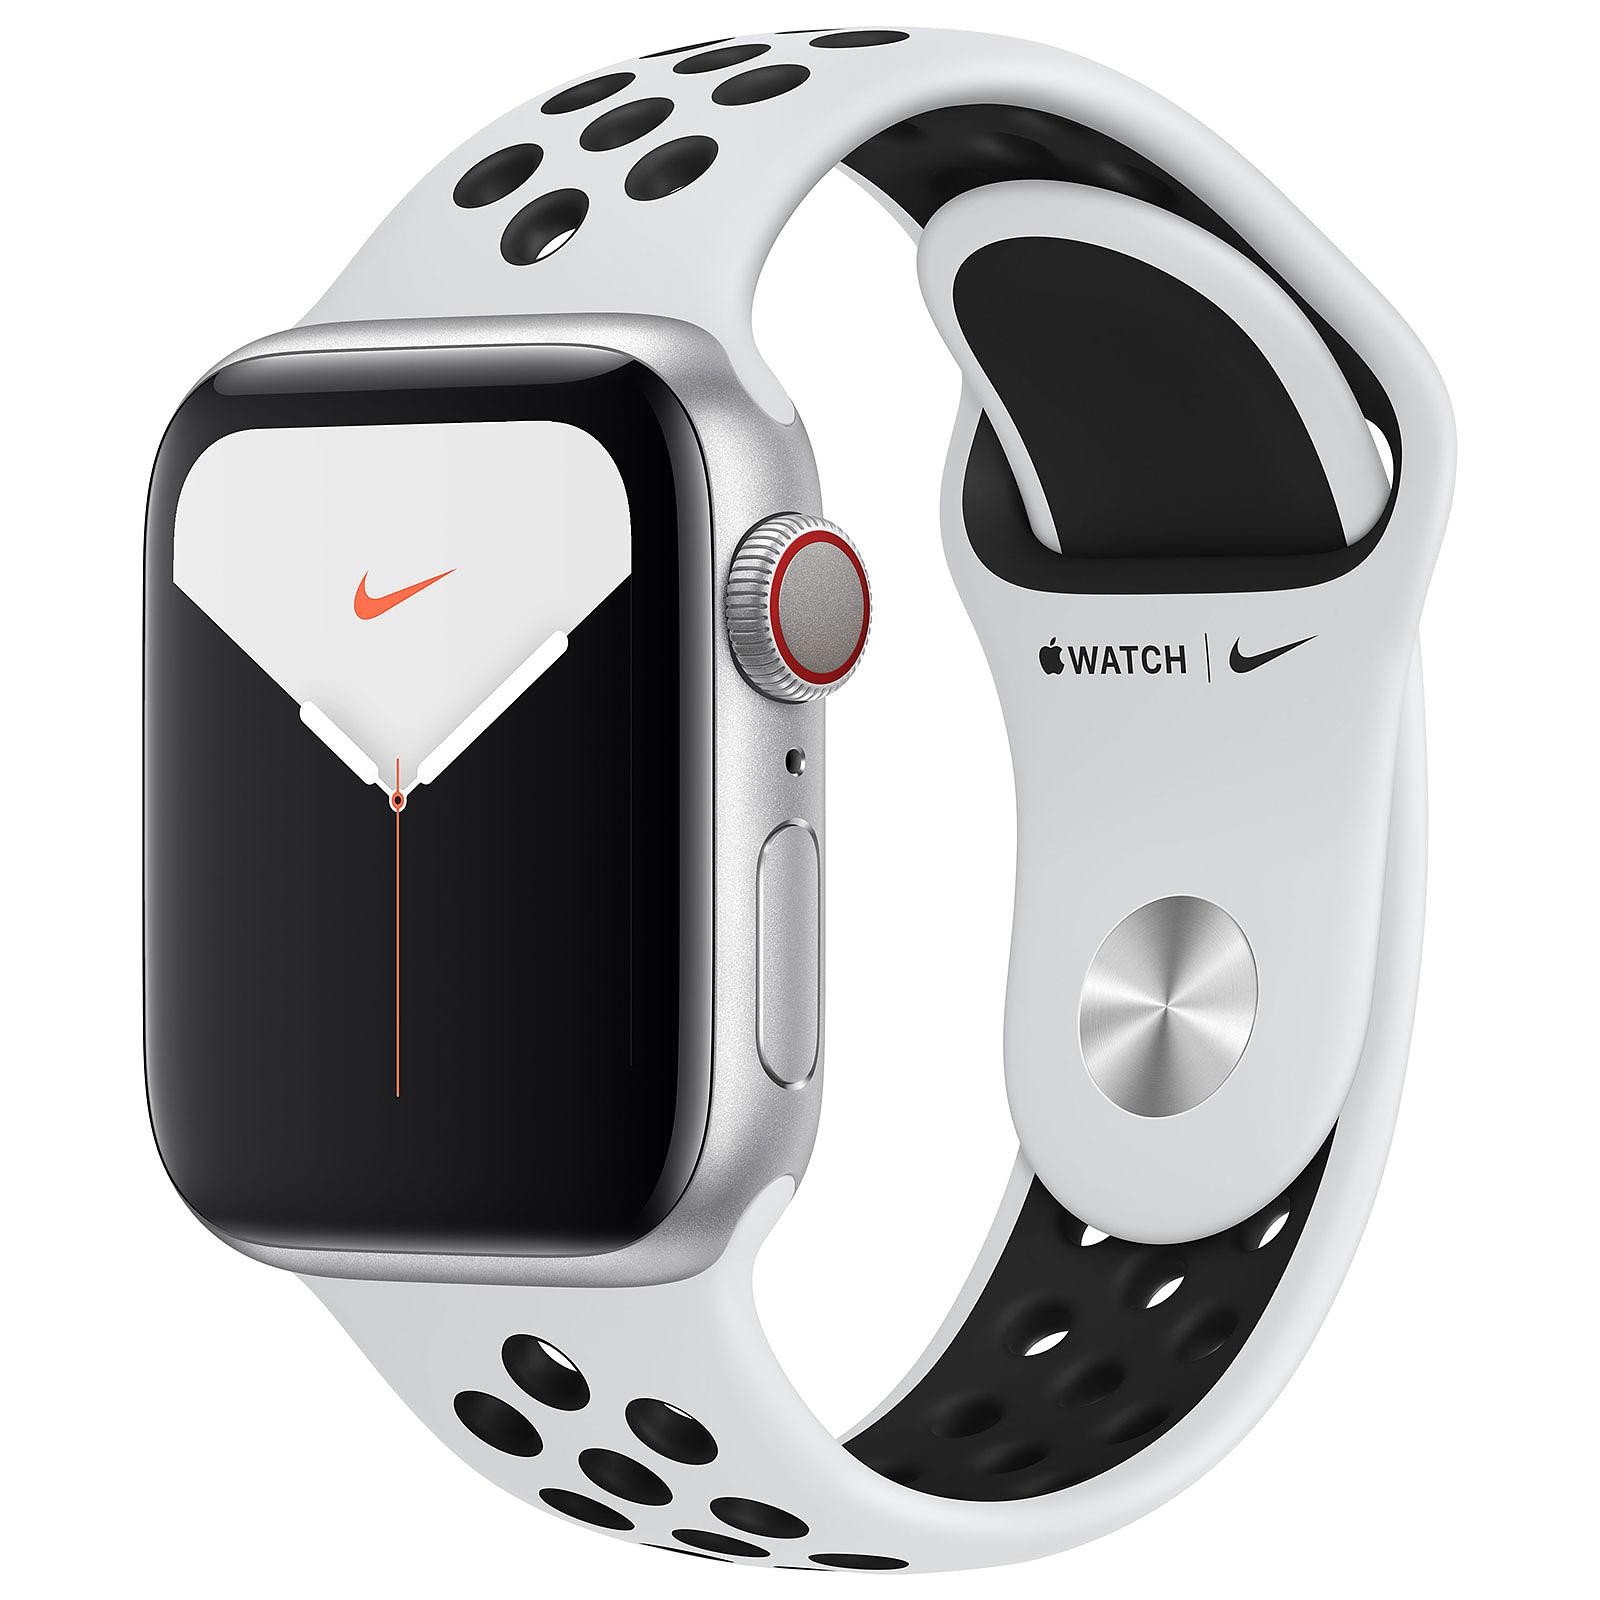 Apple Watch Series 5 Nike GPS + Cellular Aluminio Plato Pulsera deportiva Puro Platino/Negro 40 mm